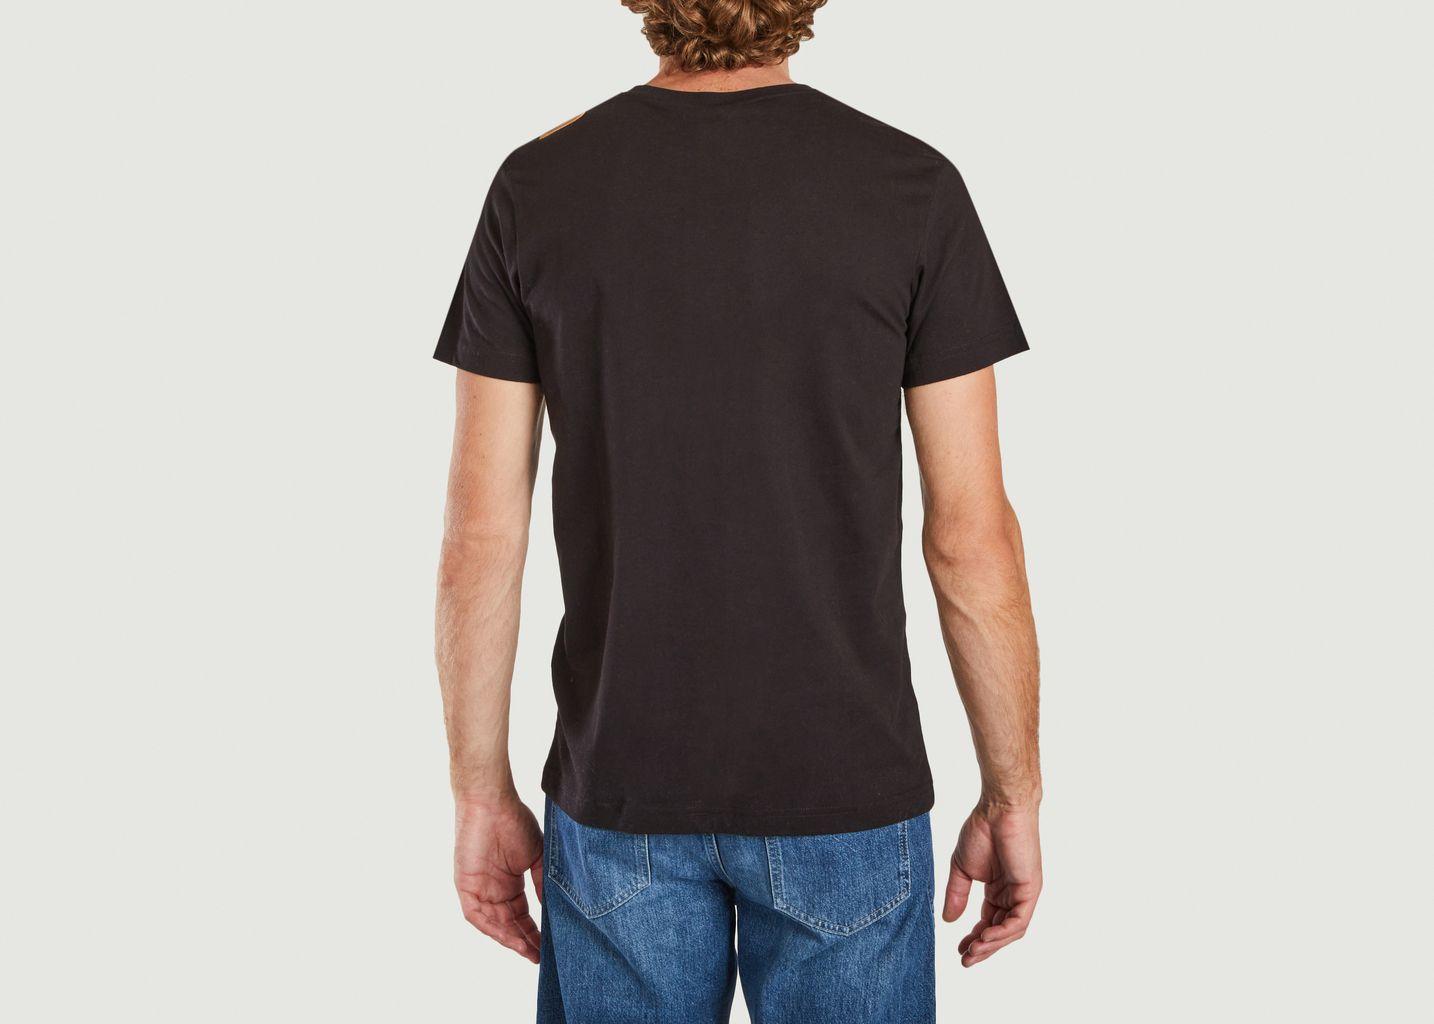 T-shirt Basement Cork Tee - Picture Organic Clothing